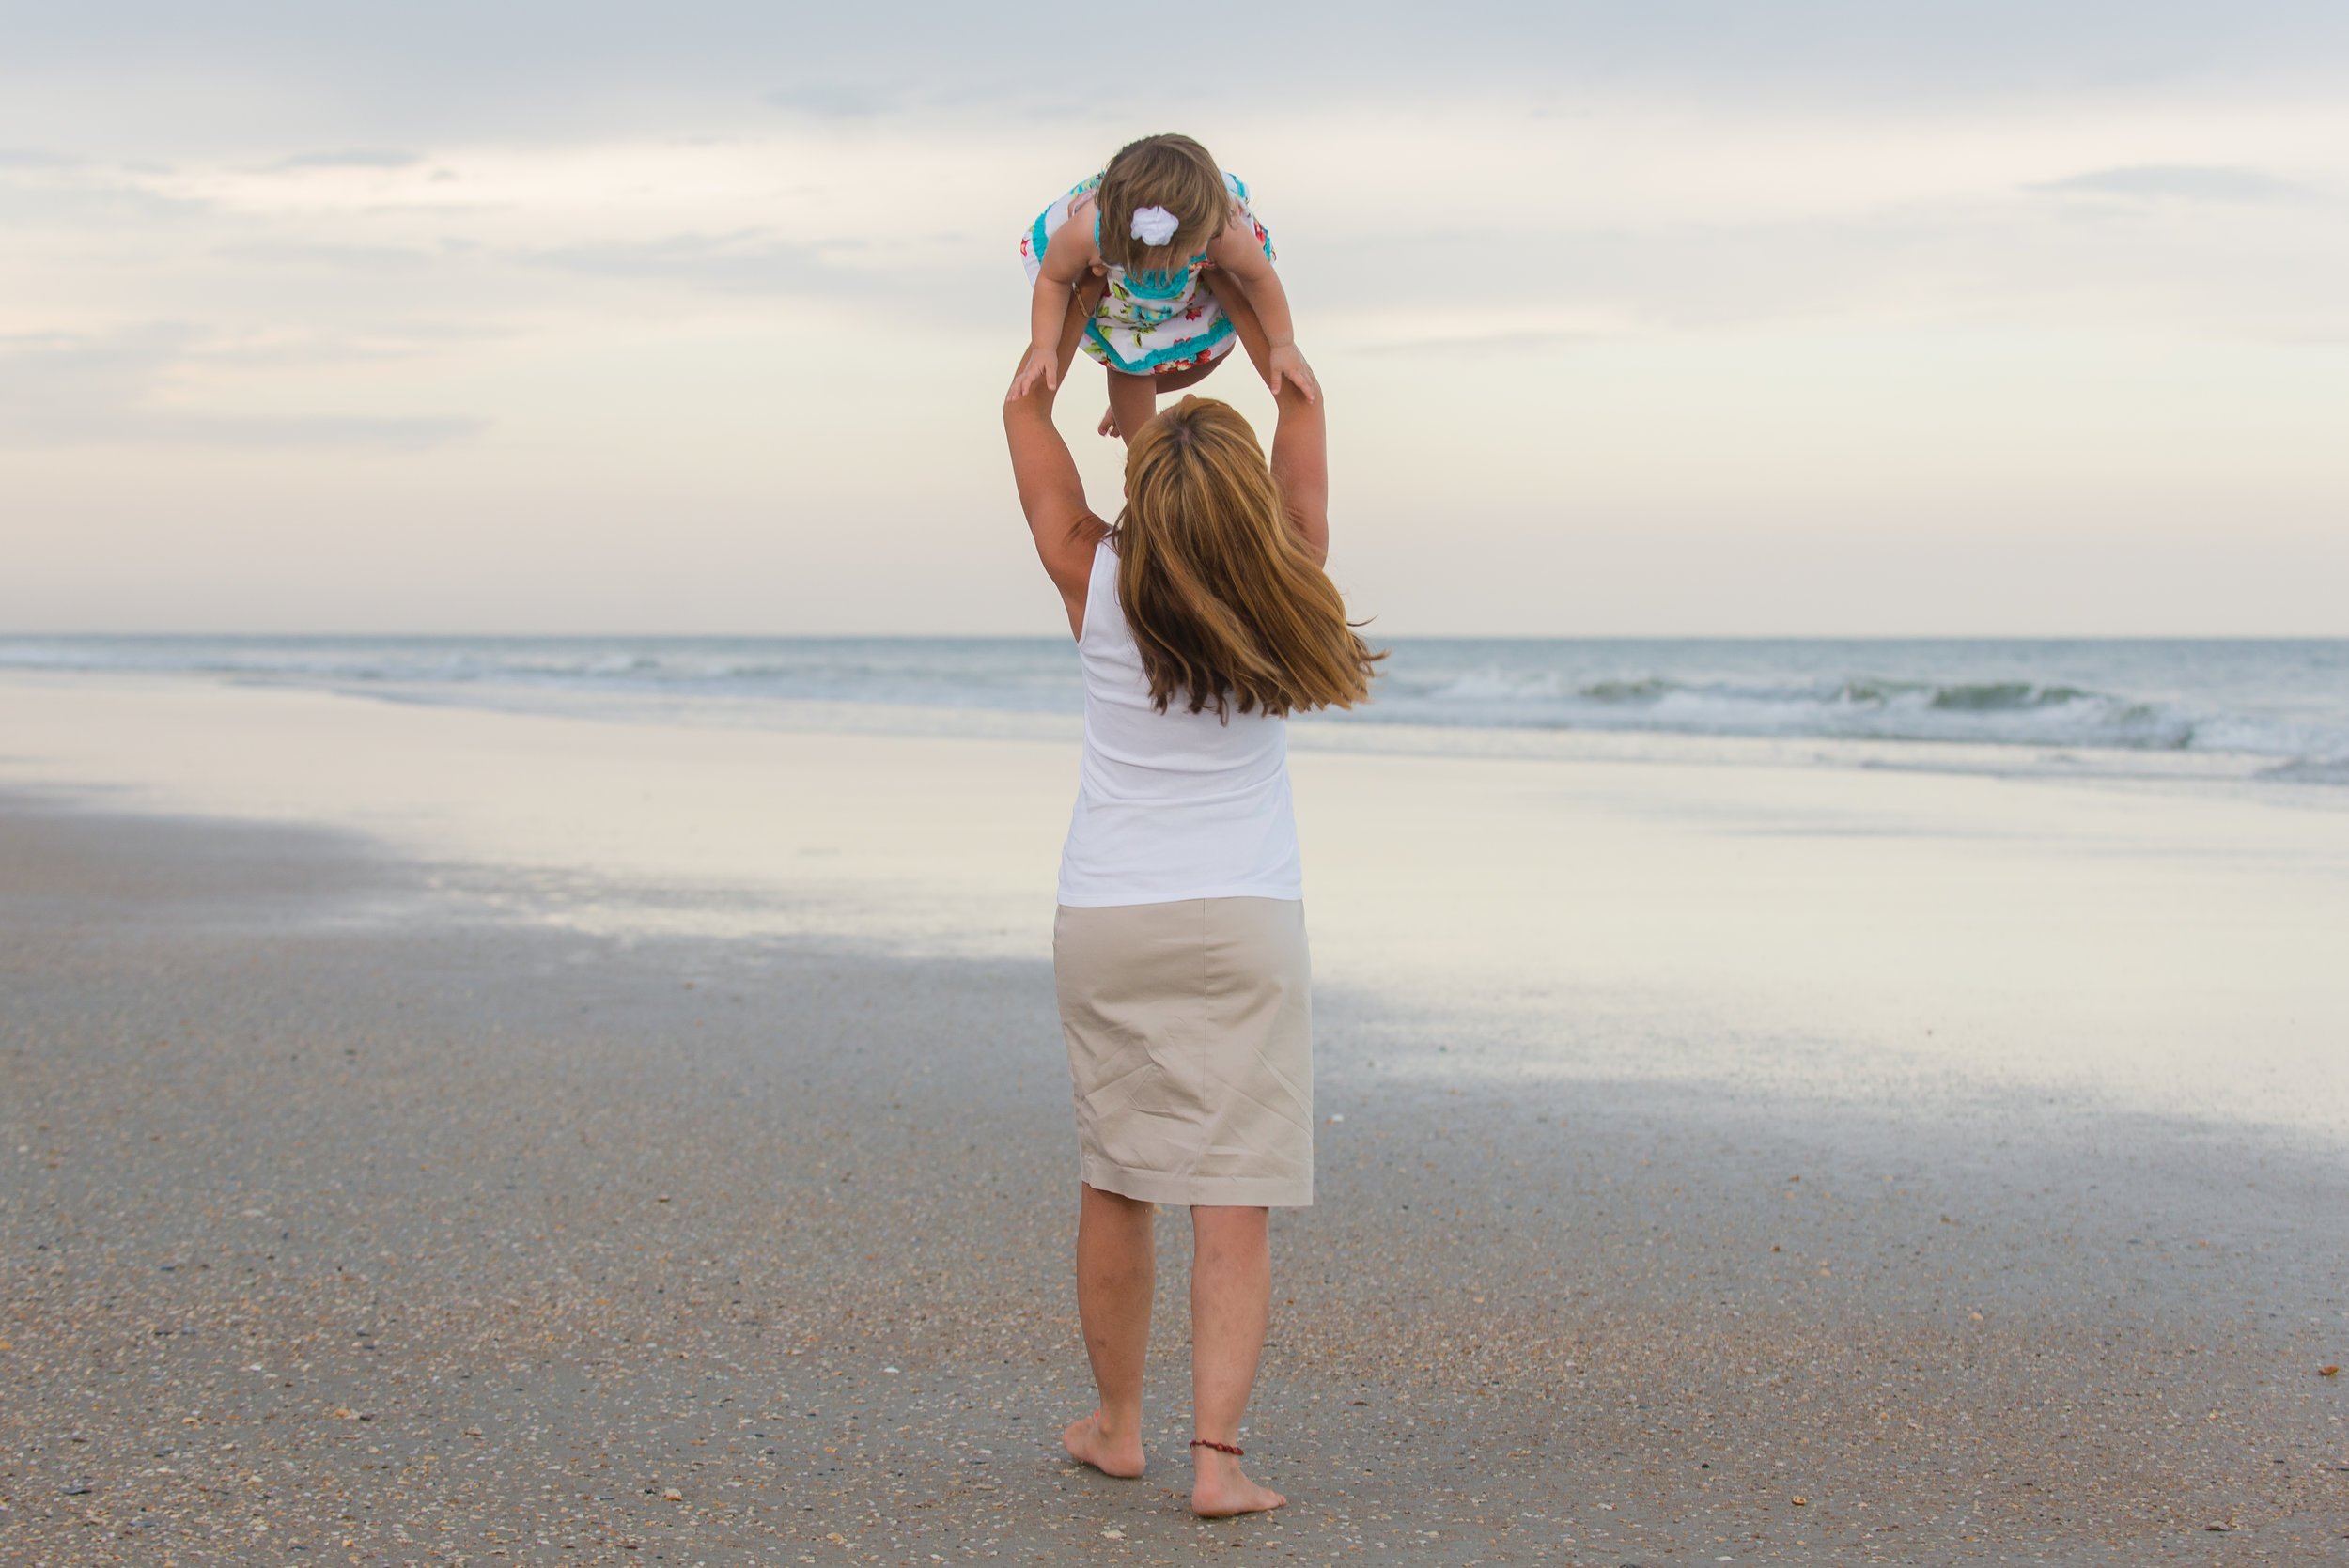 st-augustine-beach-photographer